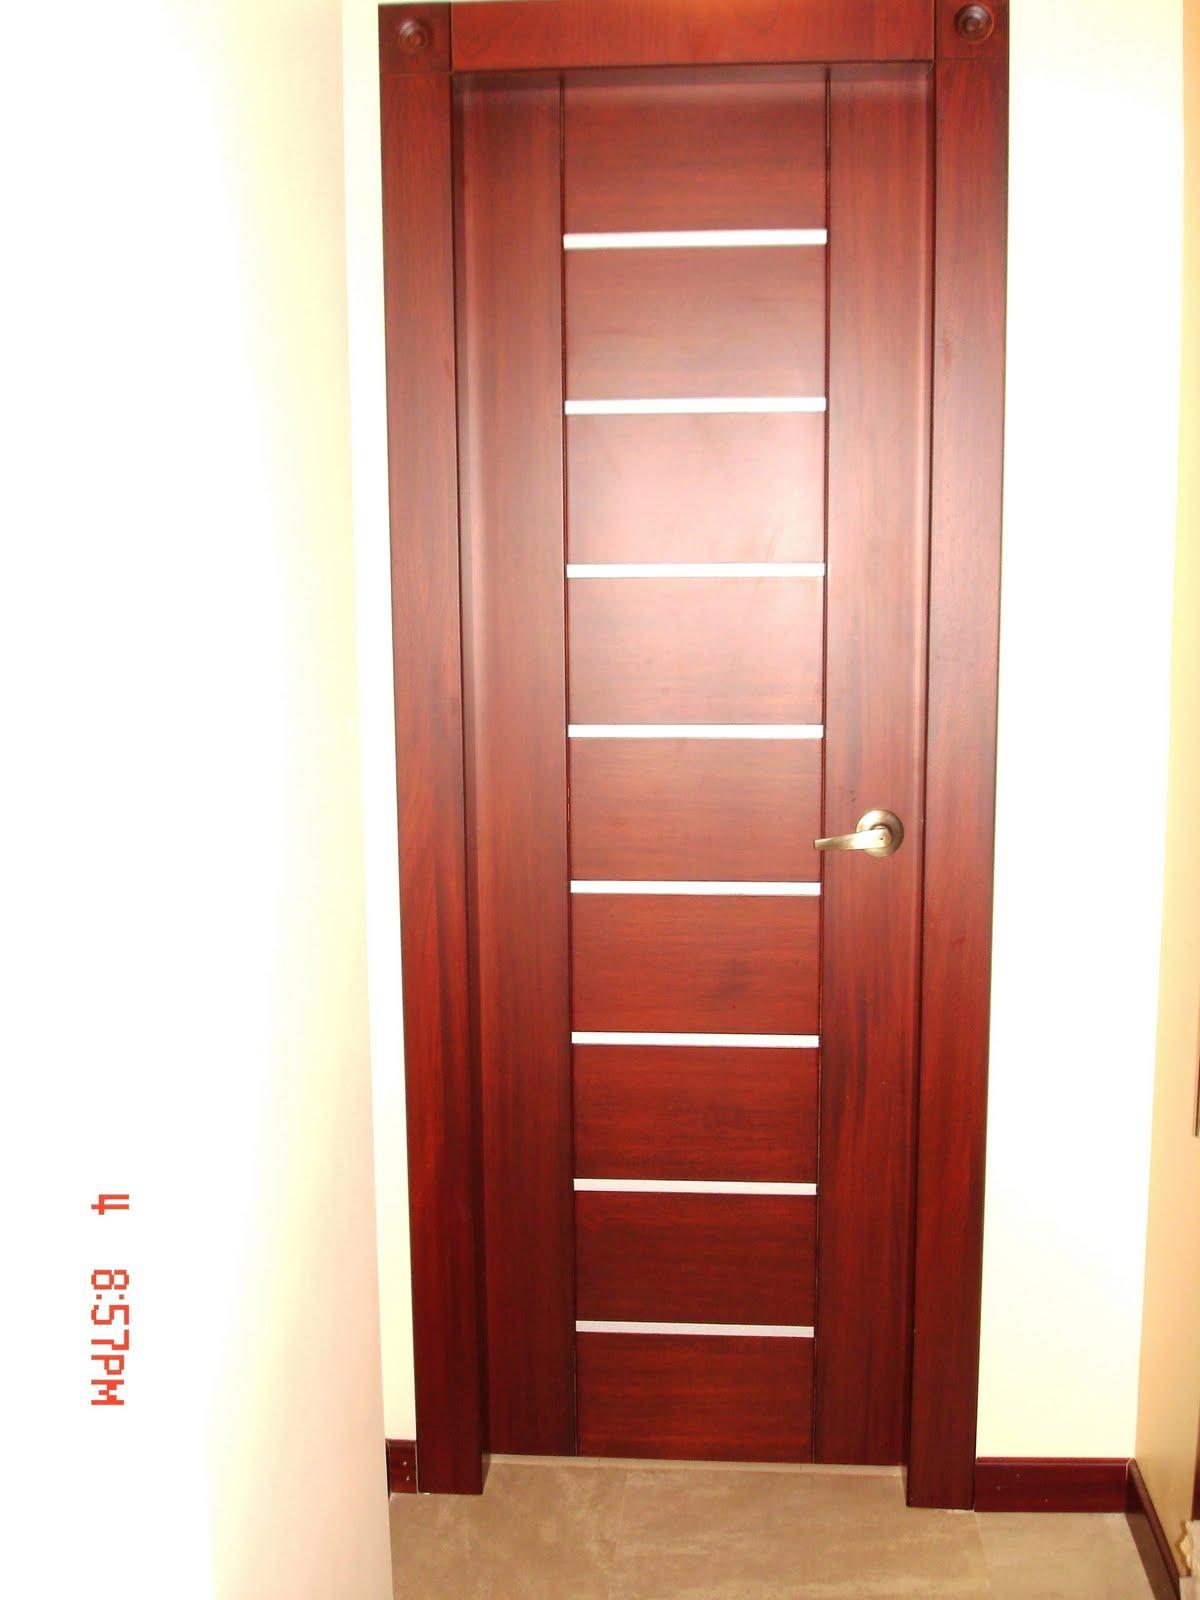 Puertas de aluminio para ba o color madera for Ver modelos de puertas de madera